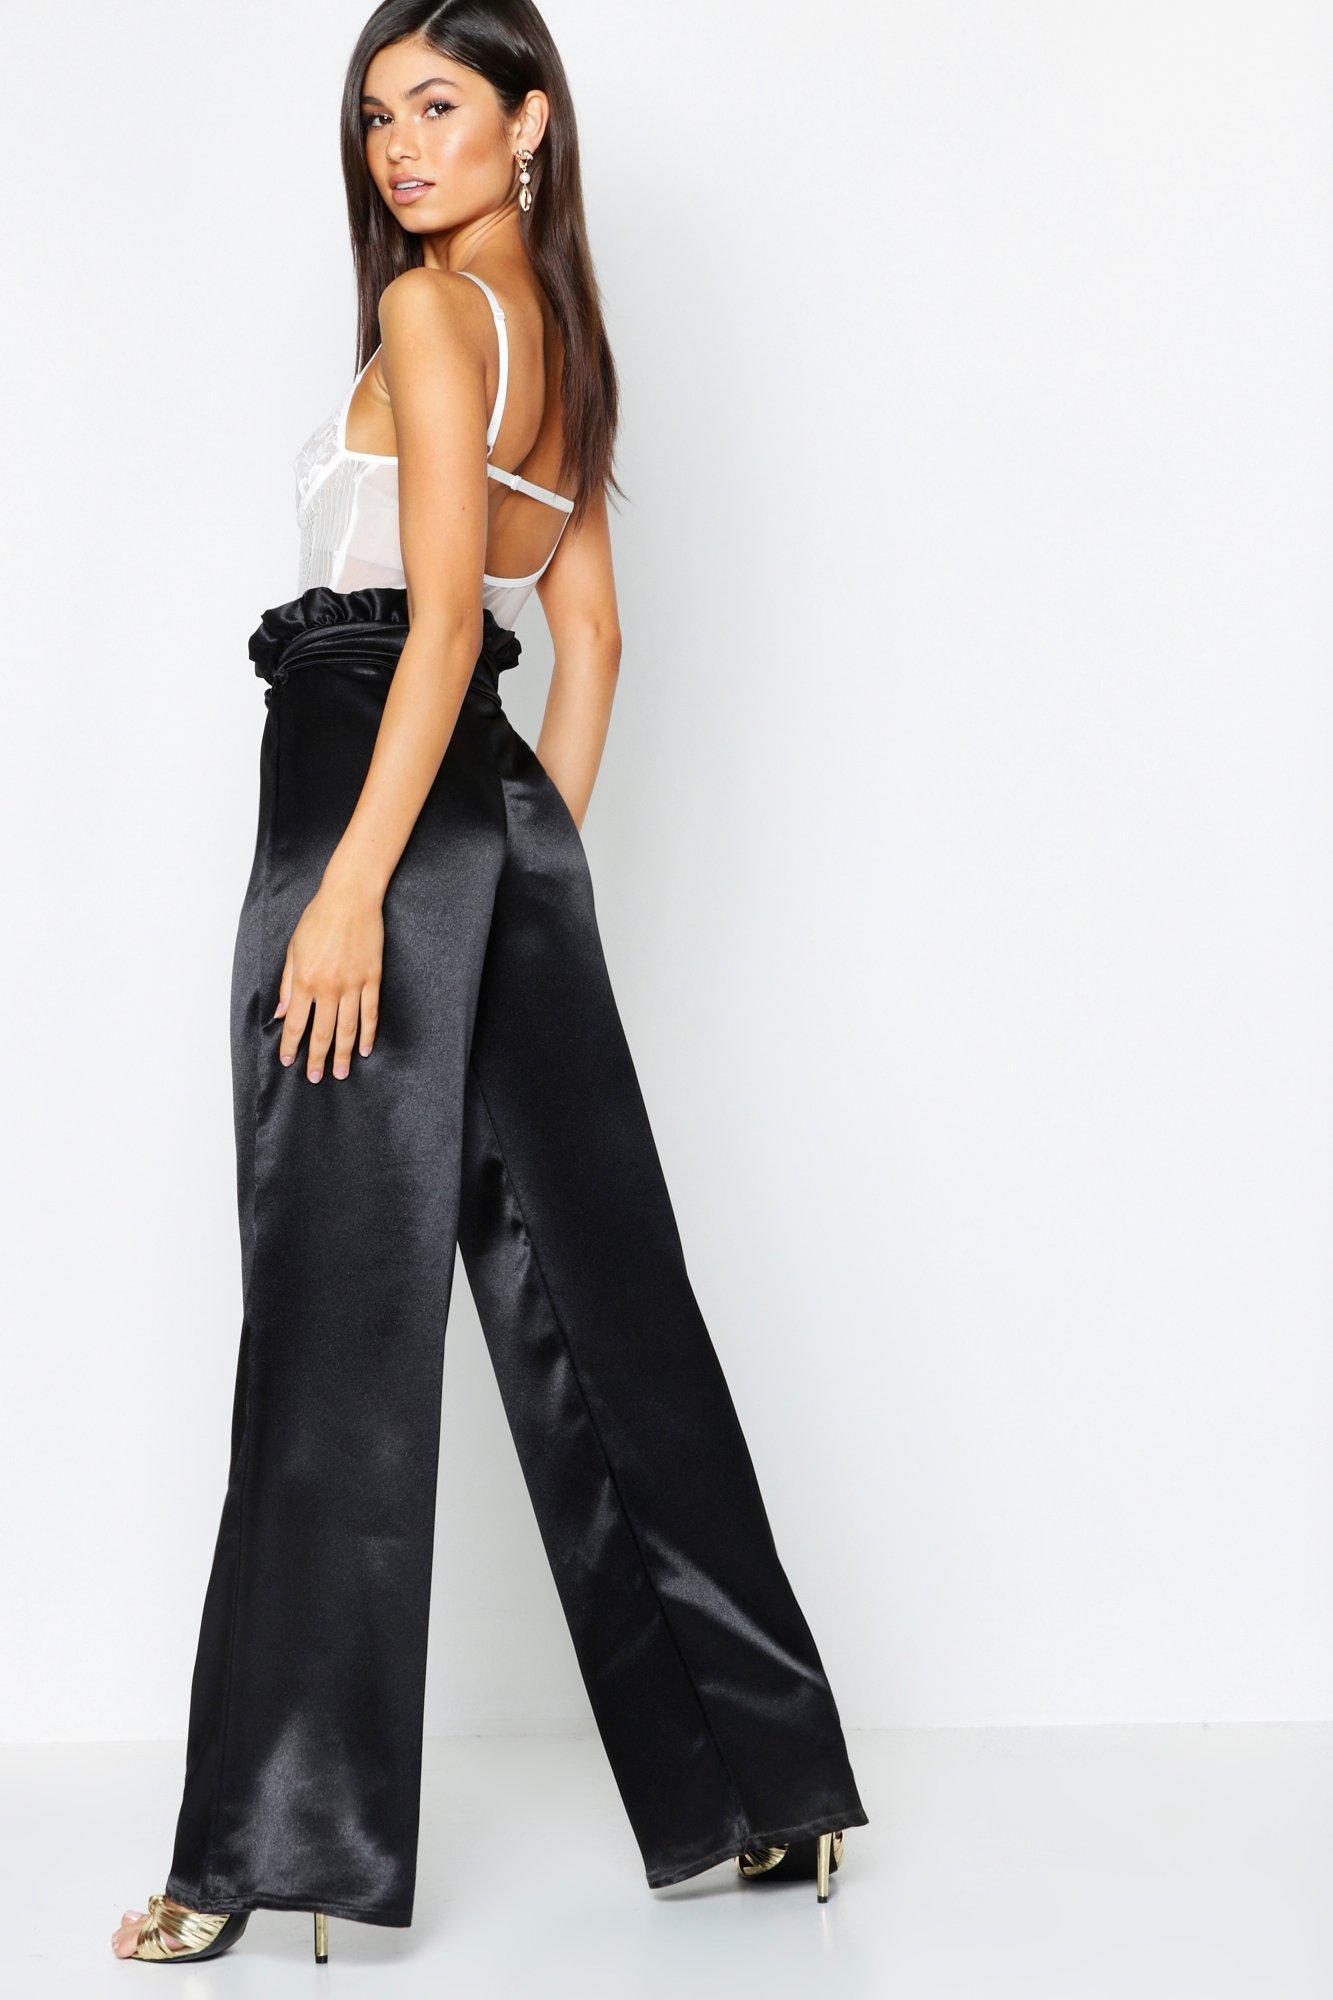 0e7a0b21c5cc Boohoo - Black Textured Satin Paperbag Wide Leg Pants - Lyst. View  fullscreen